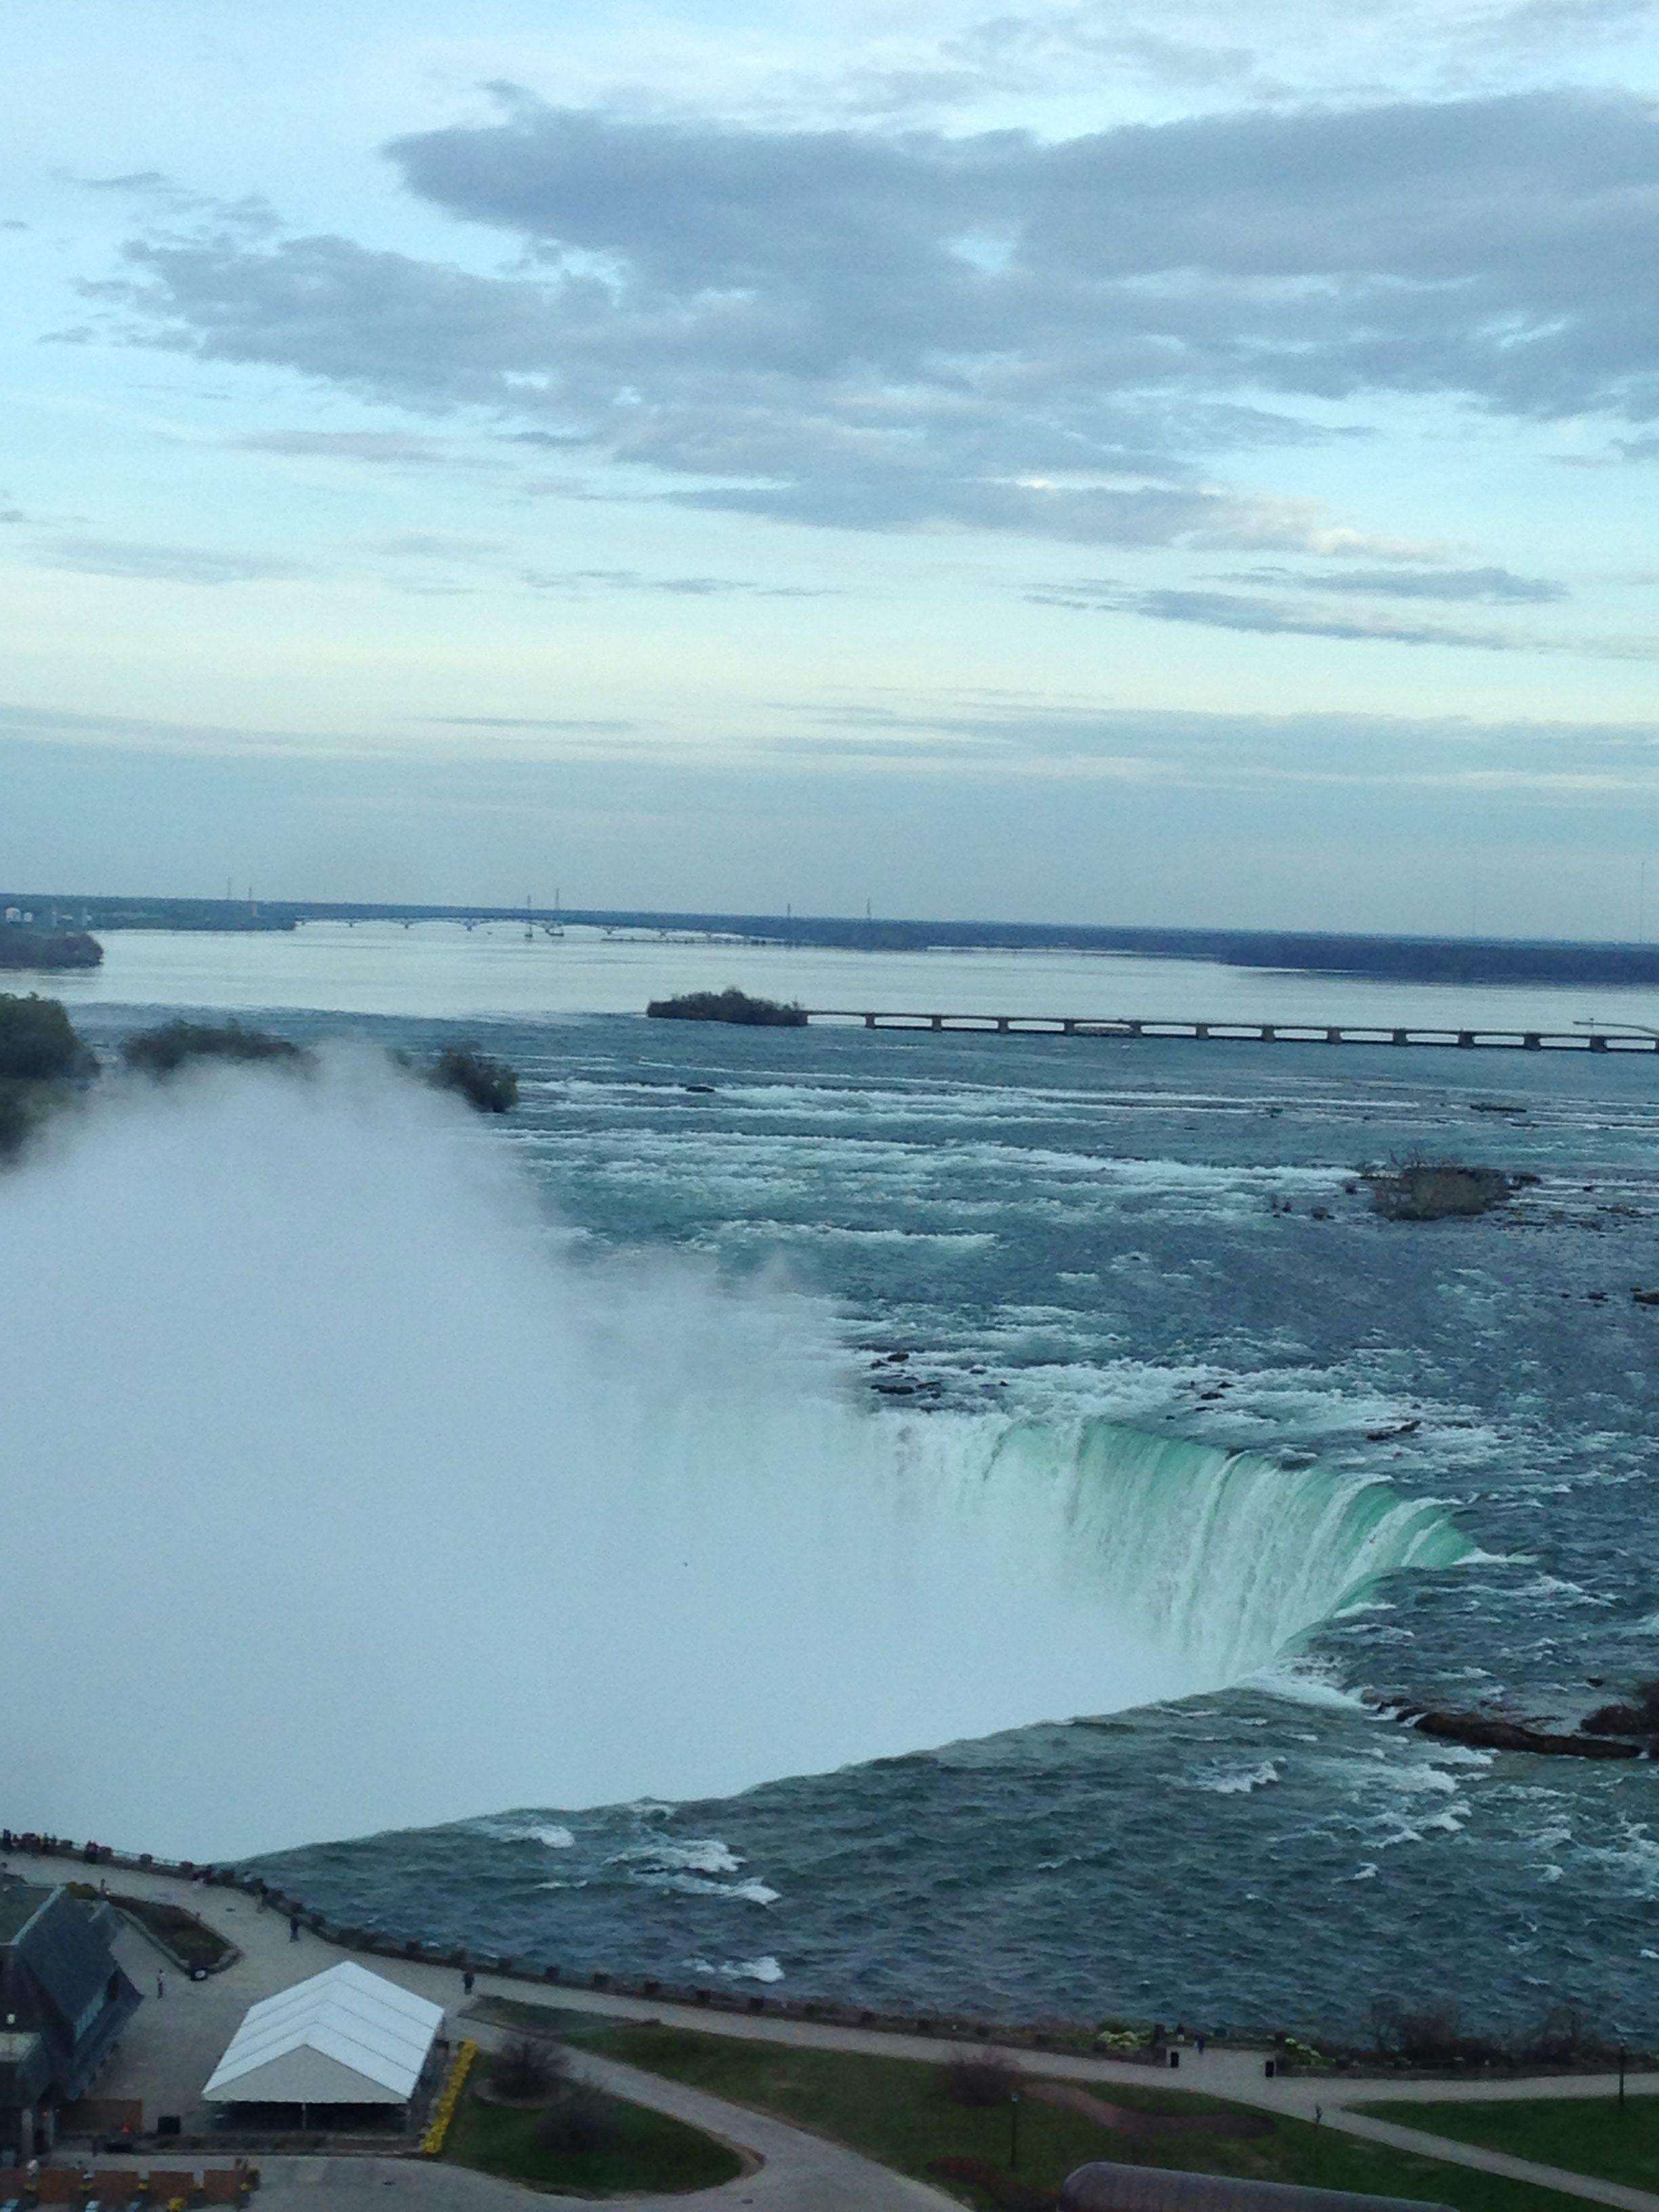 Niagarafalls places i have been pinterest - Formentera maggio bagno ...